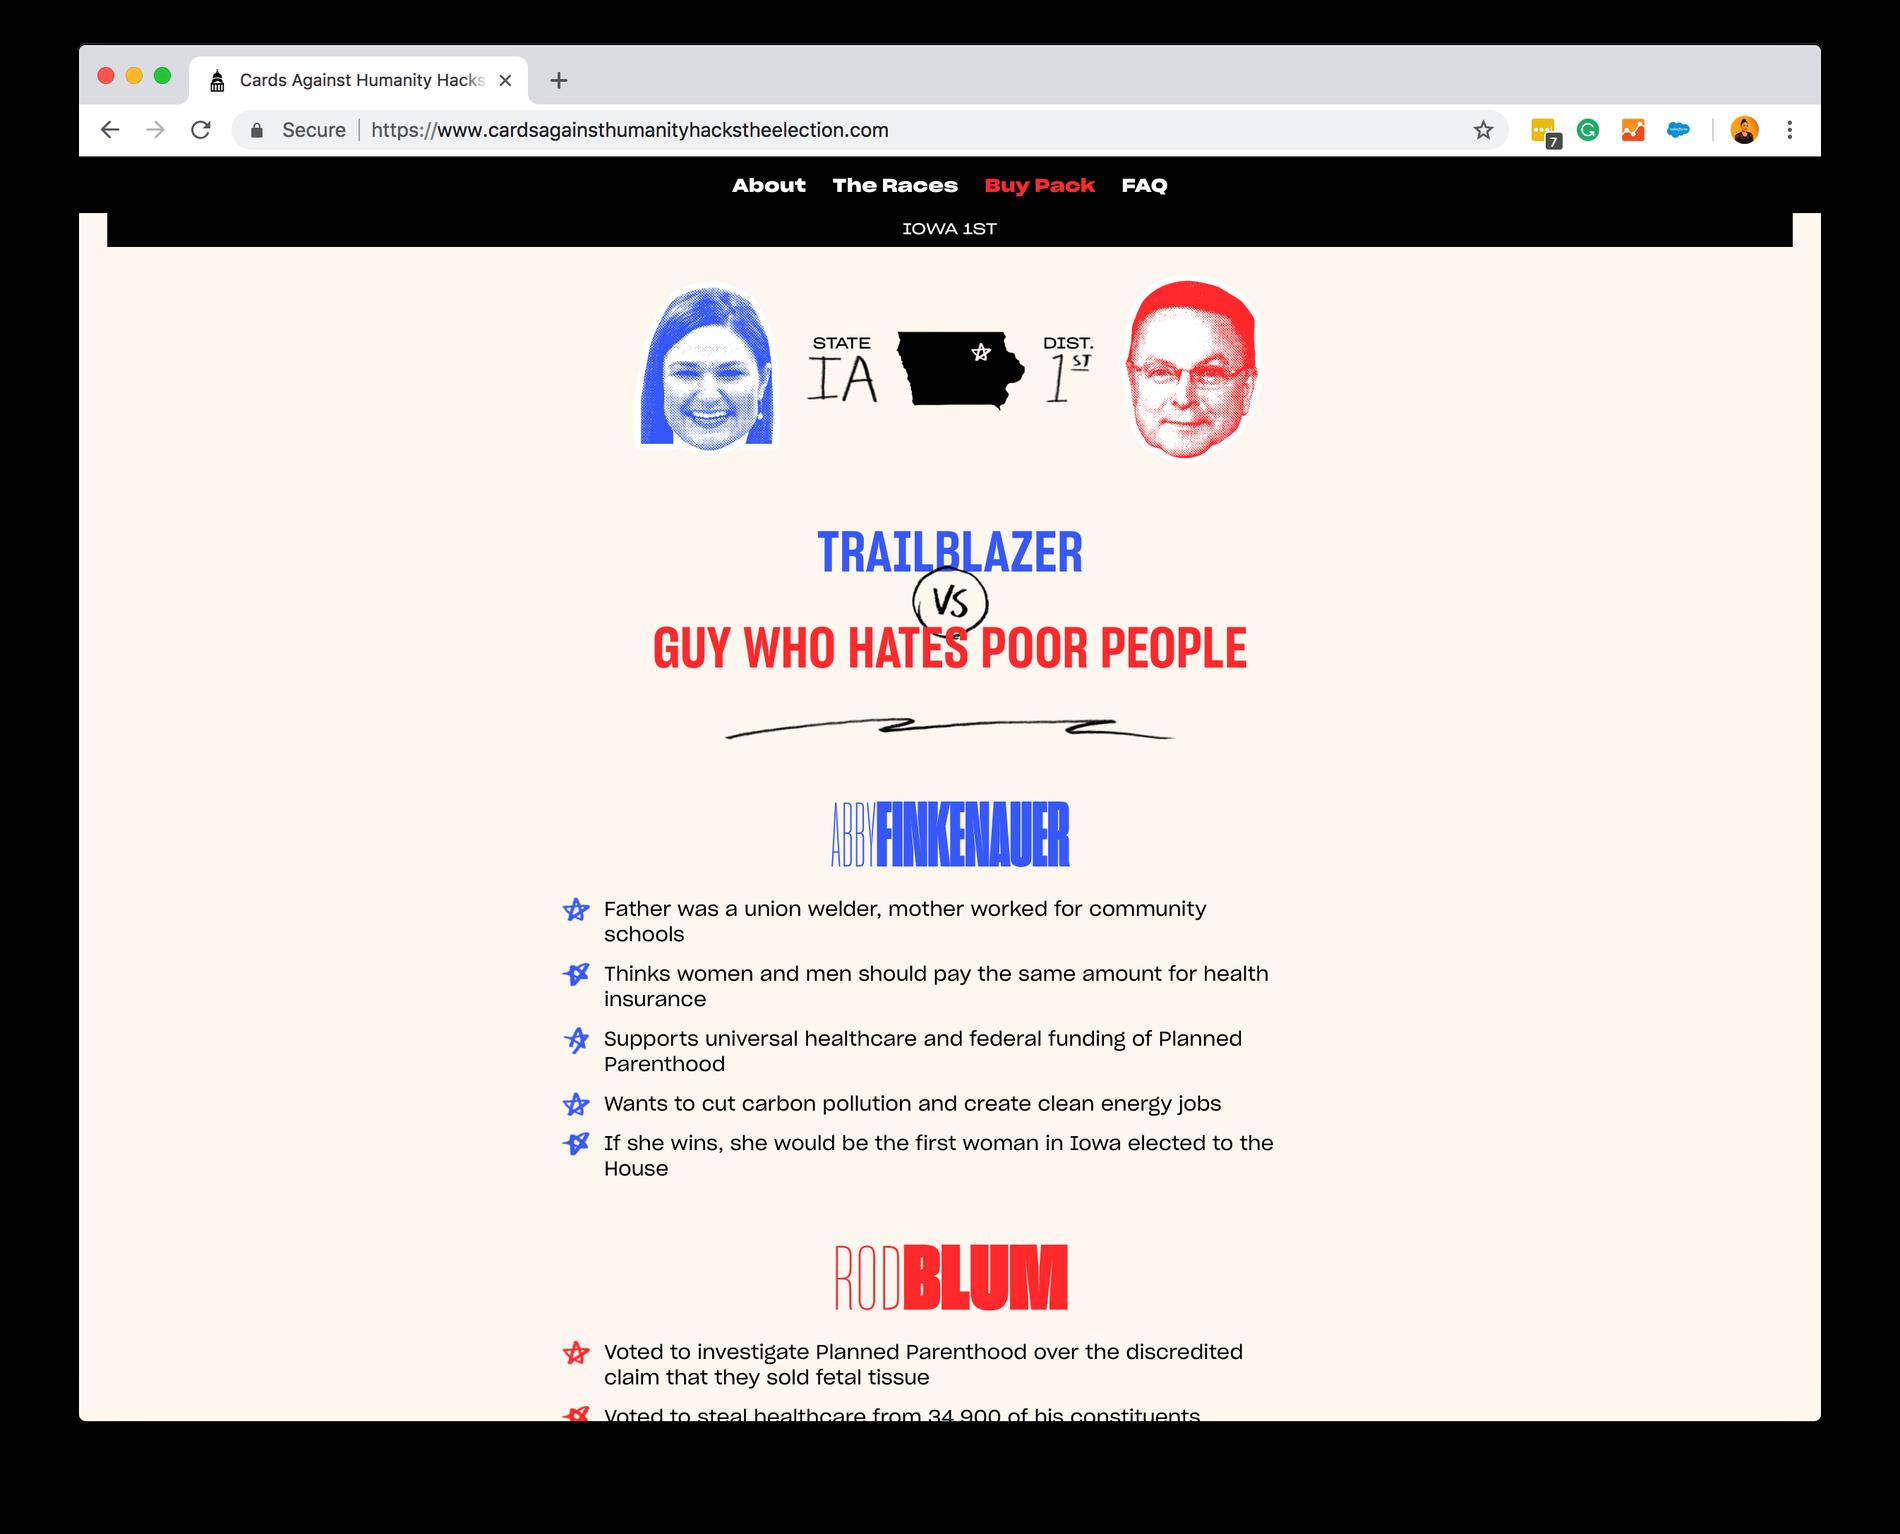 Sharp-Type-Cards-Against-Humanity-Hacks-Election-Web-IA-4